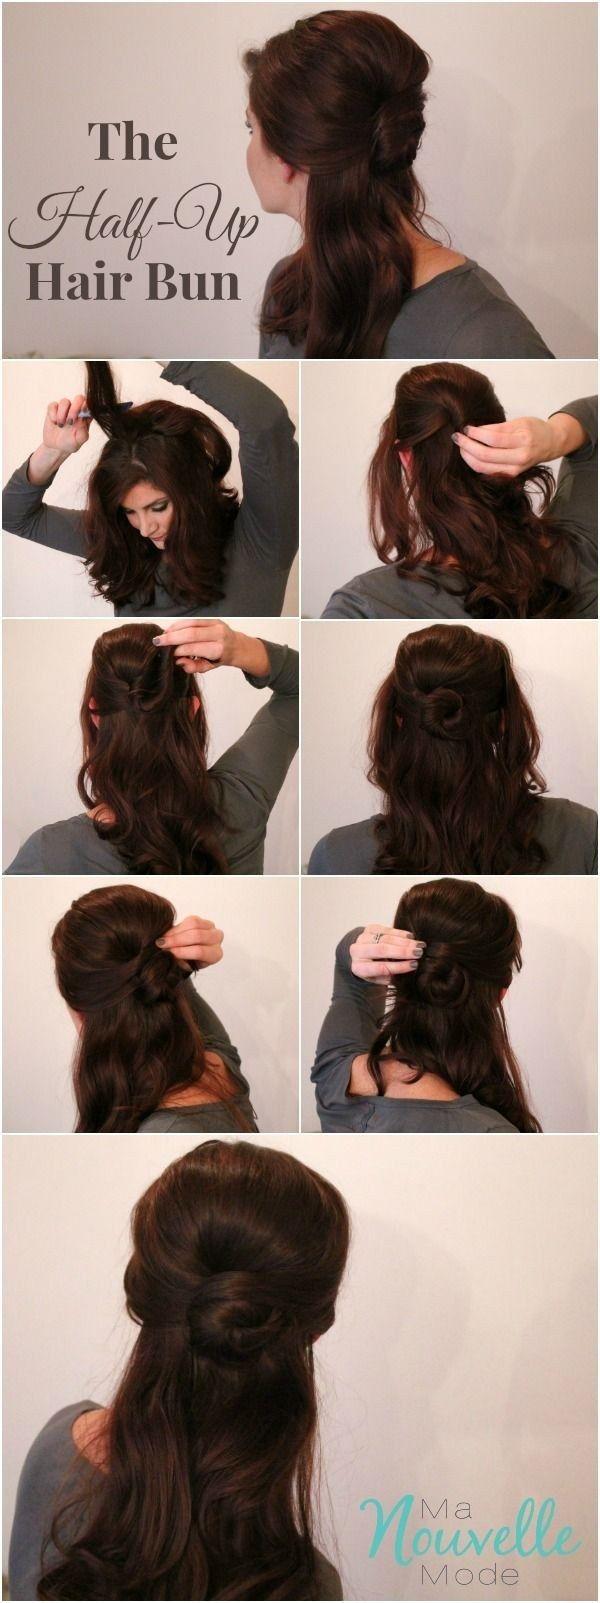 Belle's elegant half-up bun